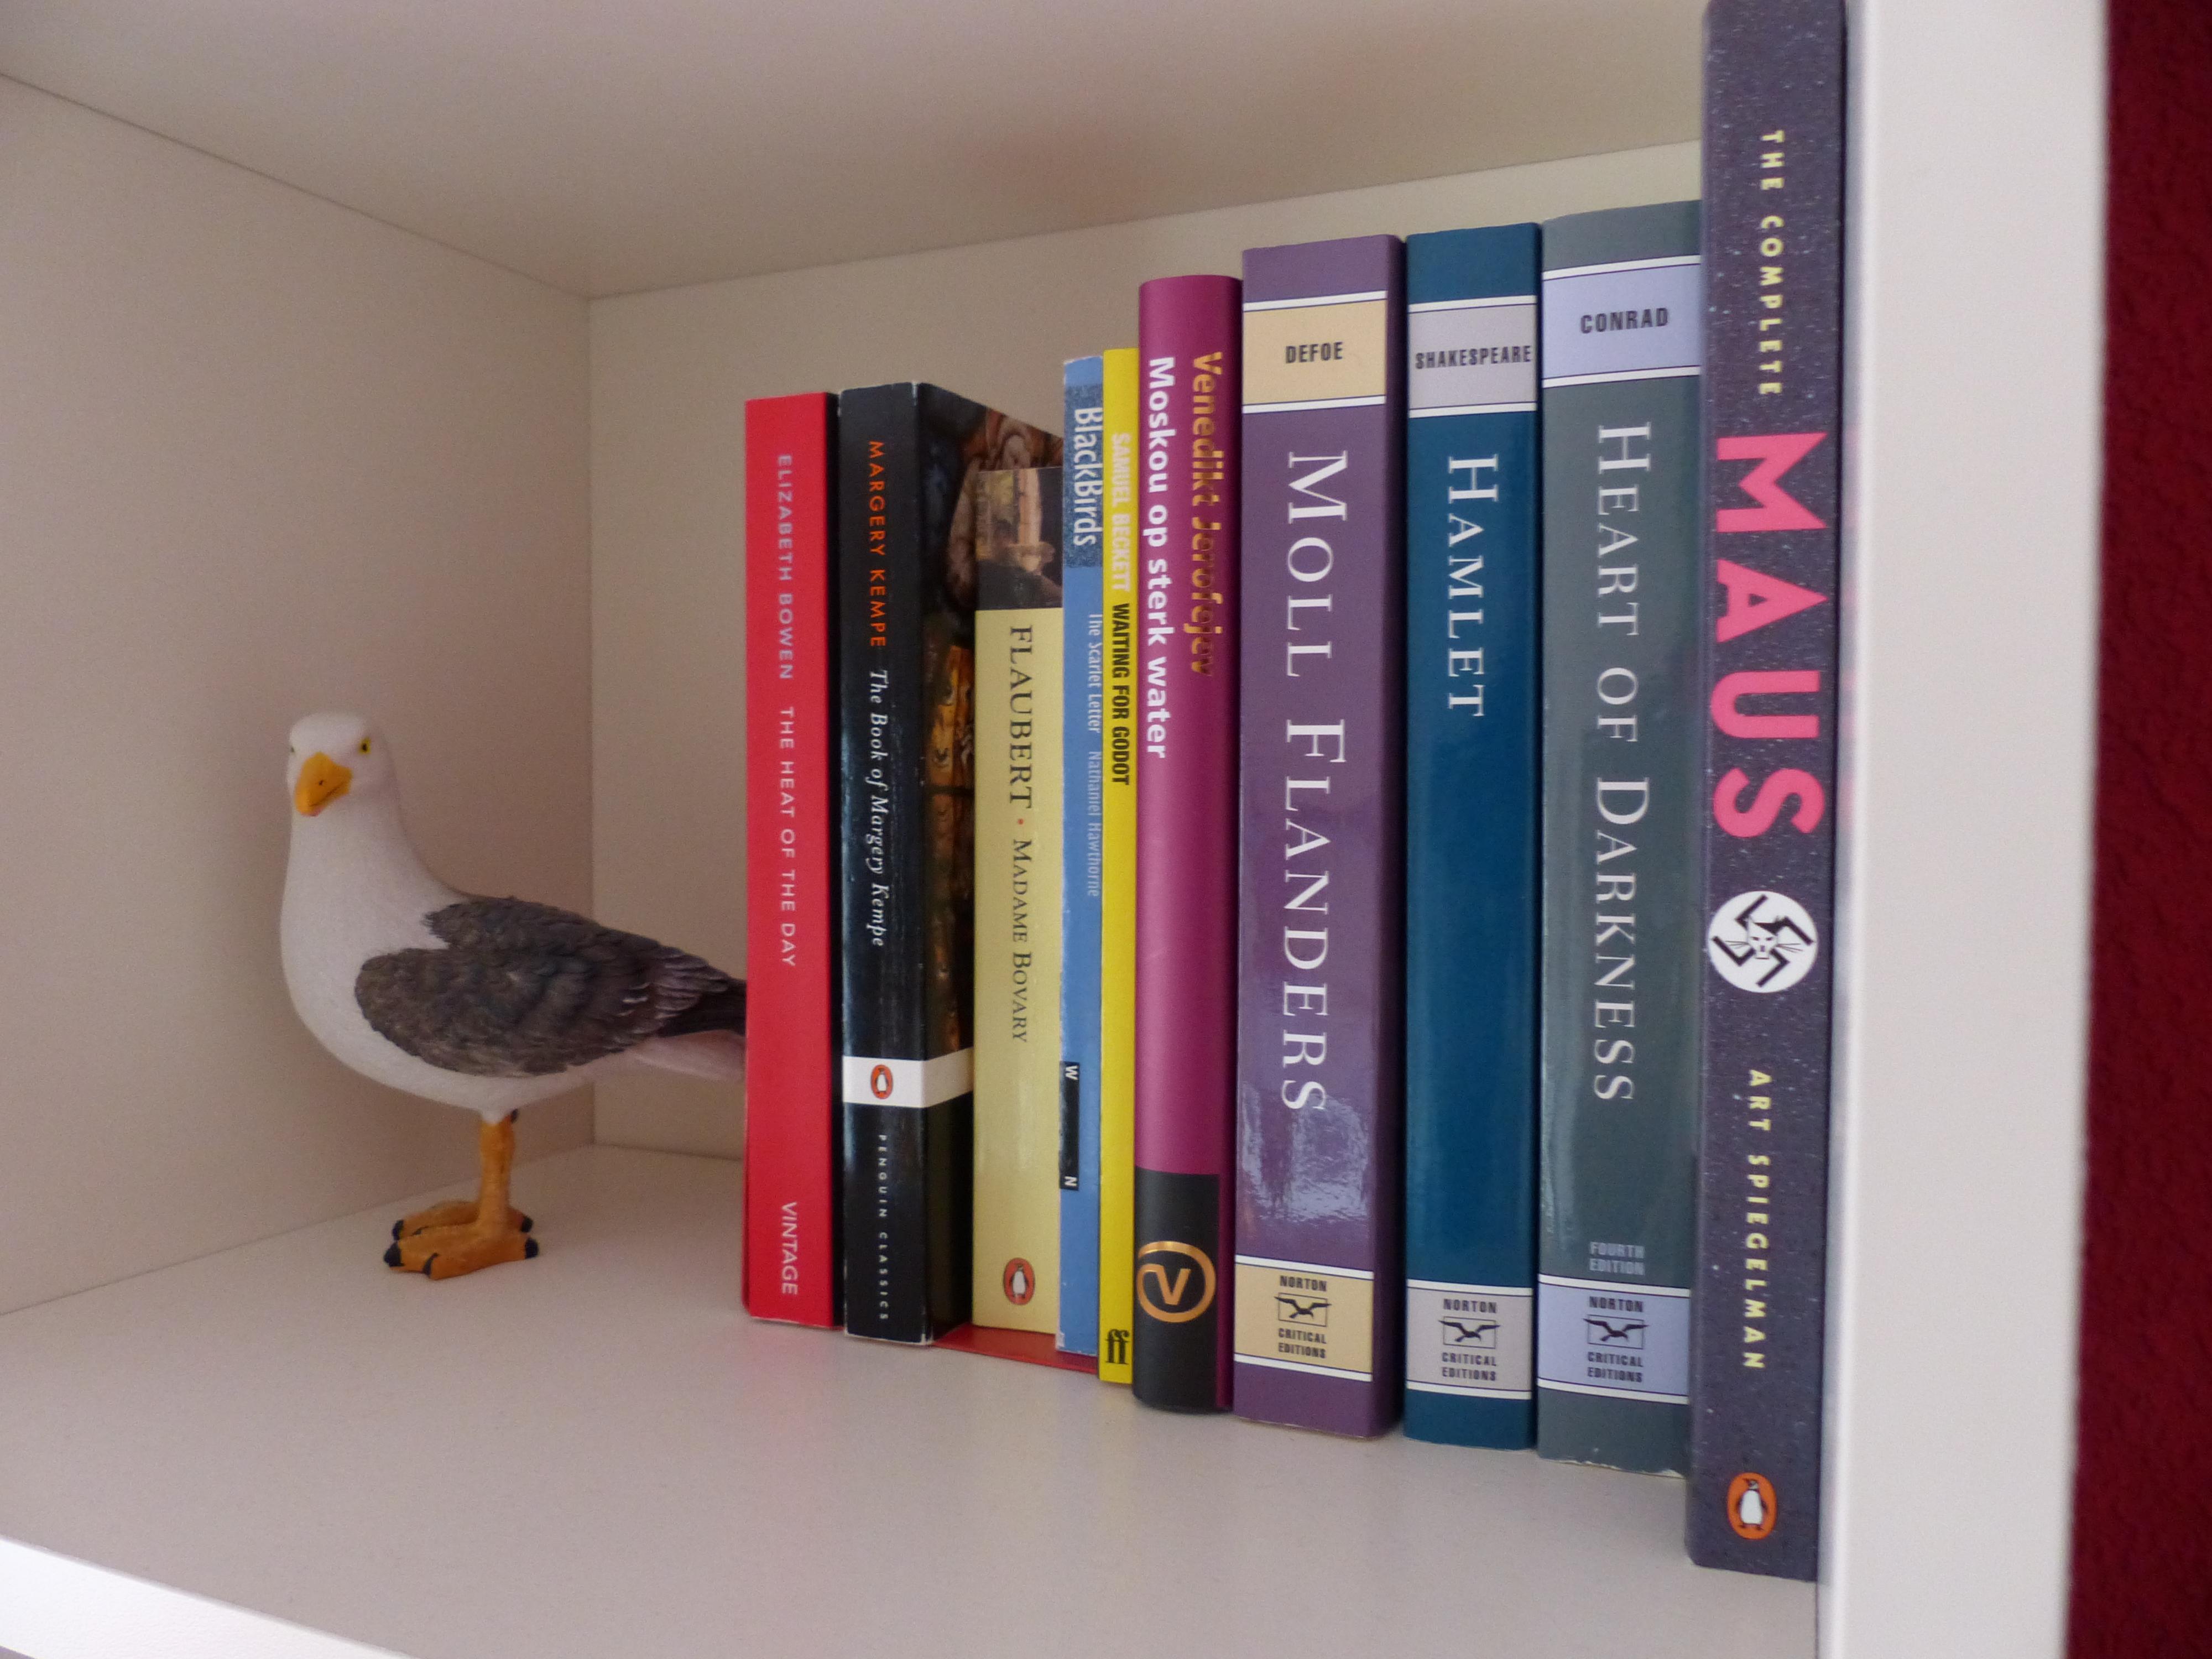 coffee bookcase com restoration table secelectro letter best bookshelf inspirations ideas of hardware bookshelves